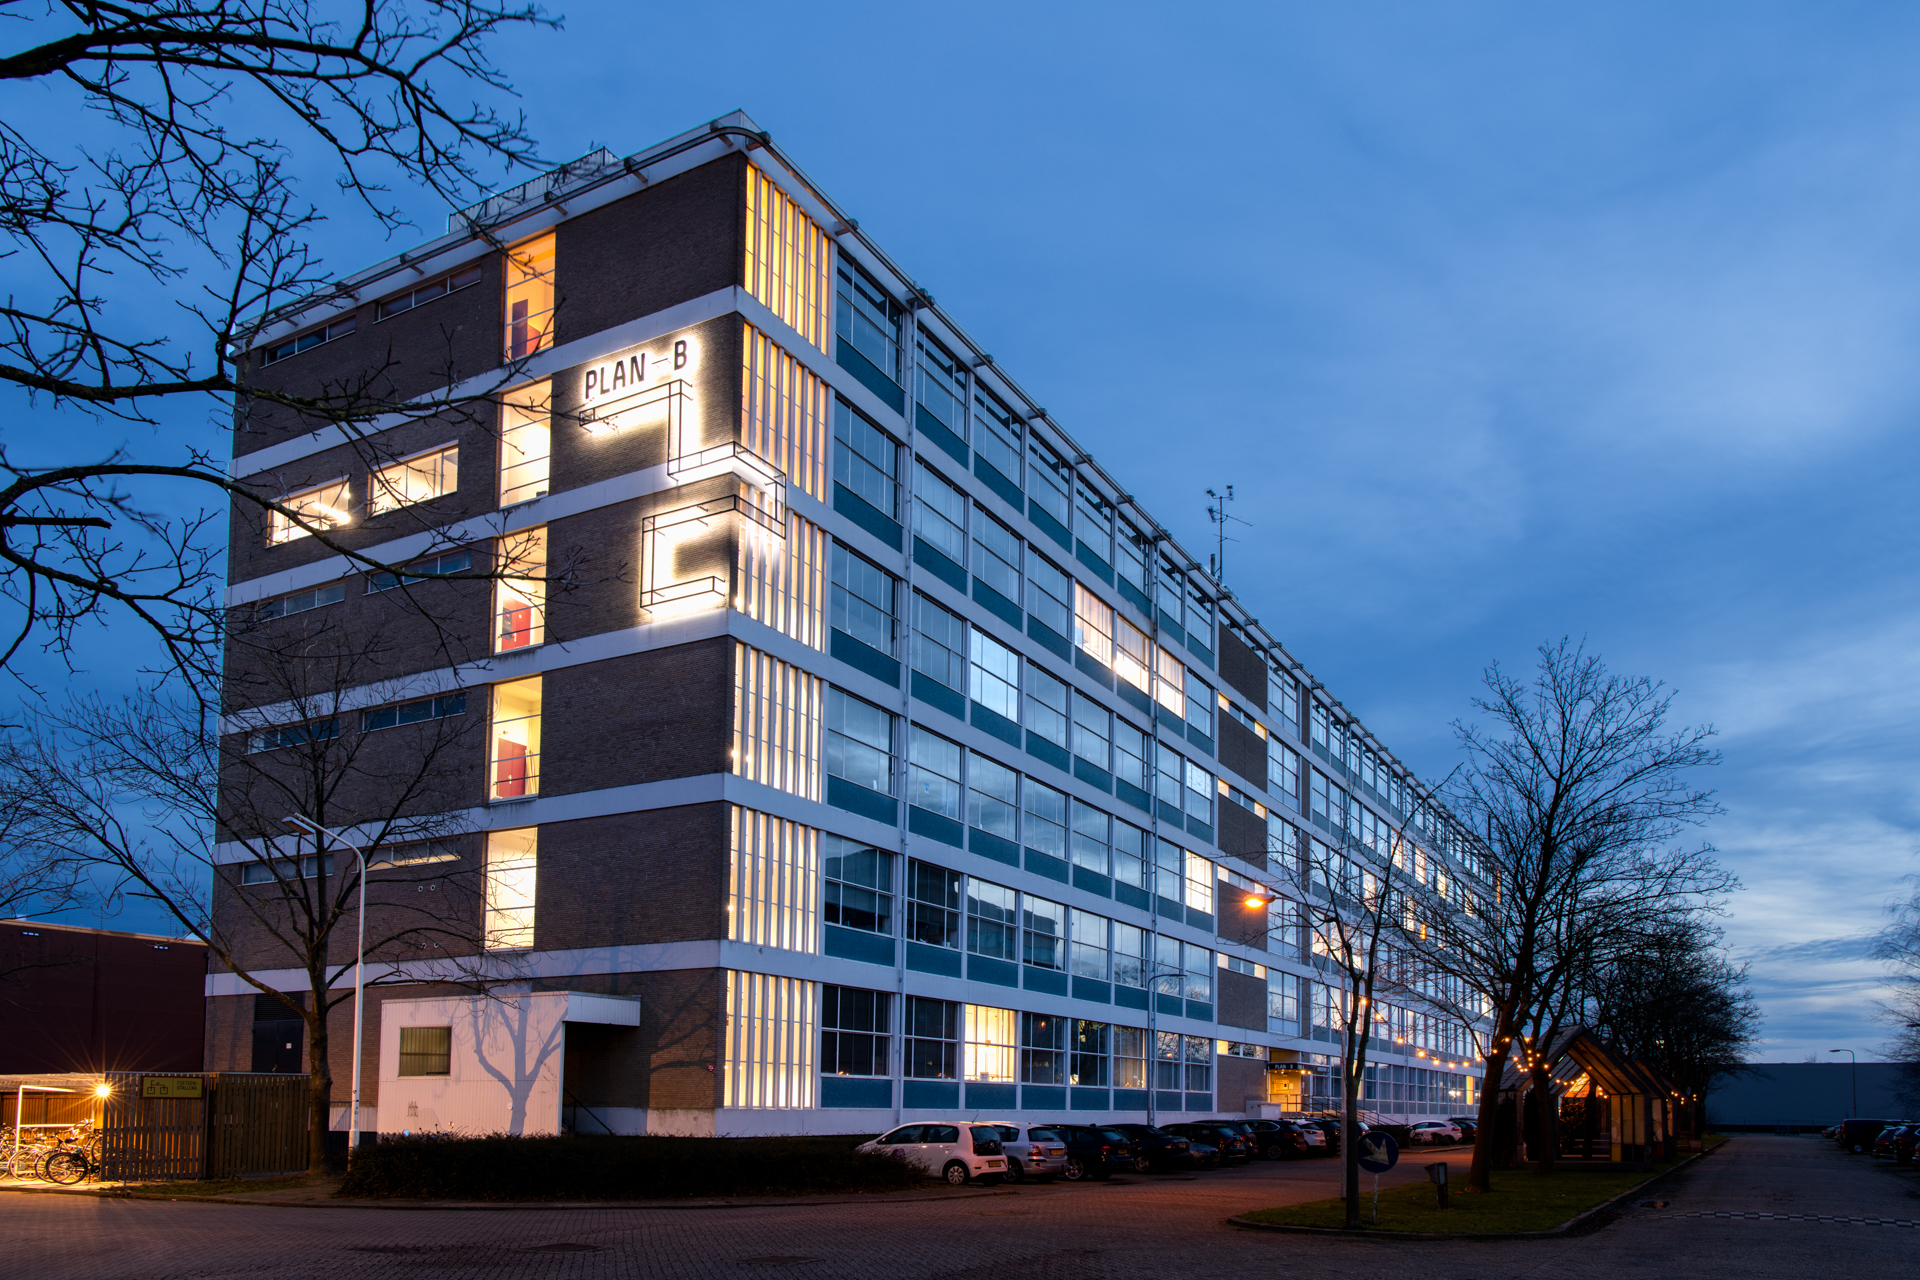 Studio-Pics2give-Plan-B-Eindhoven